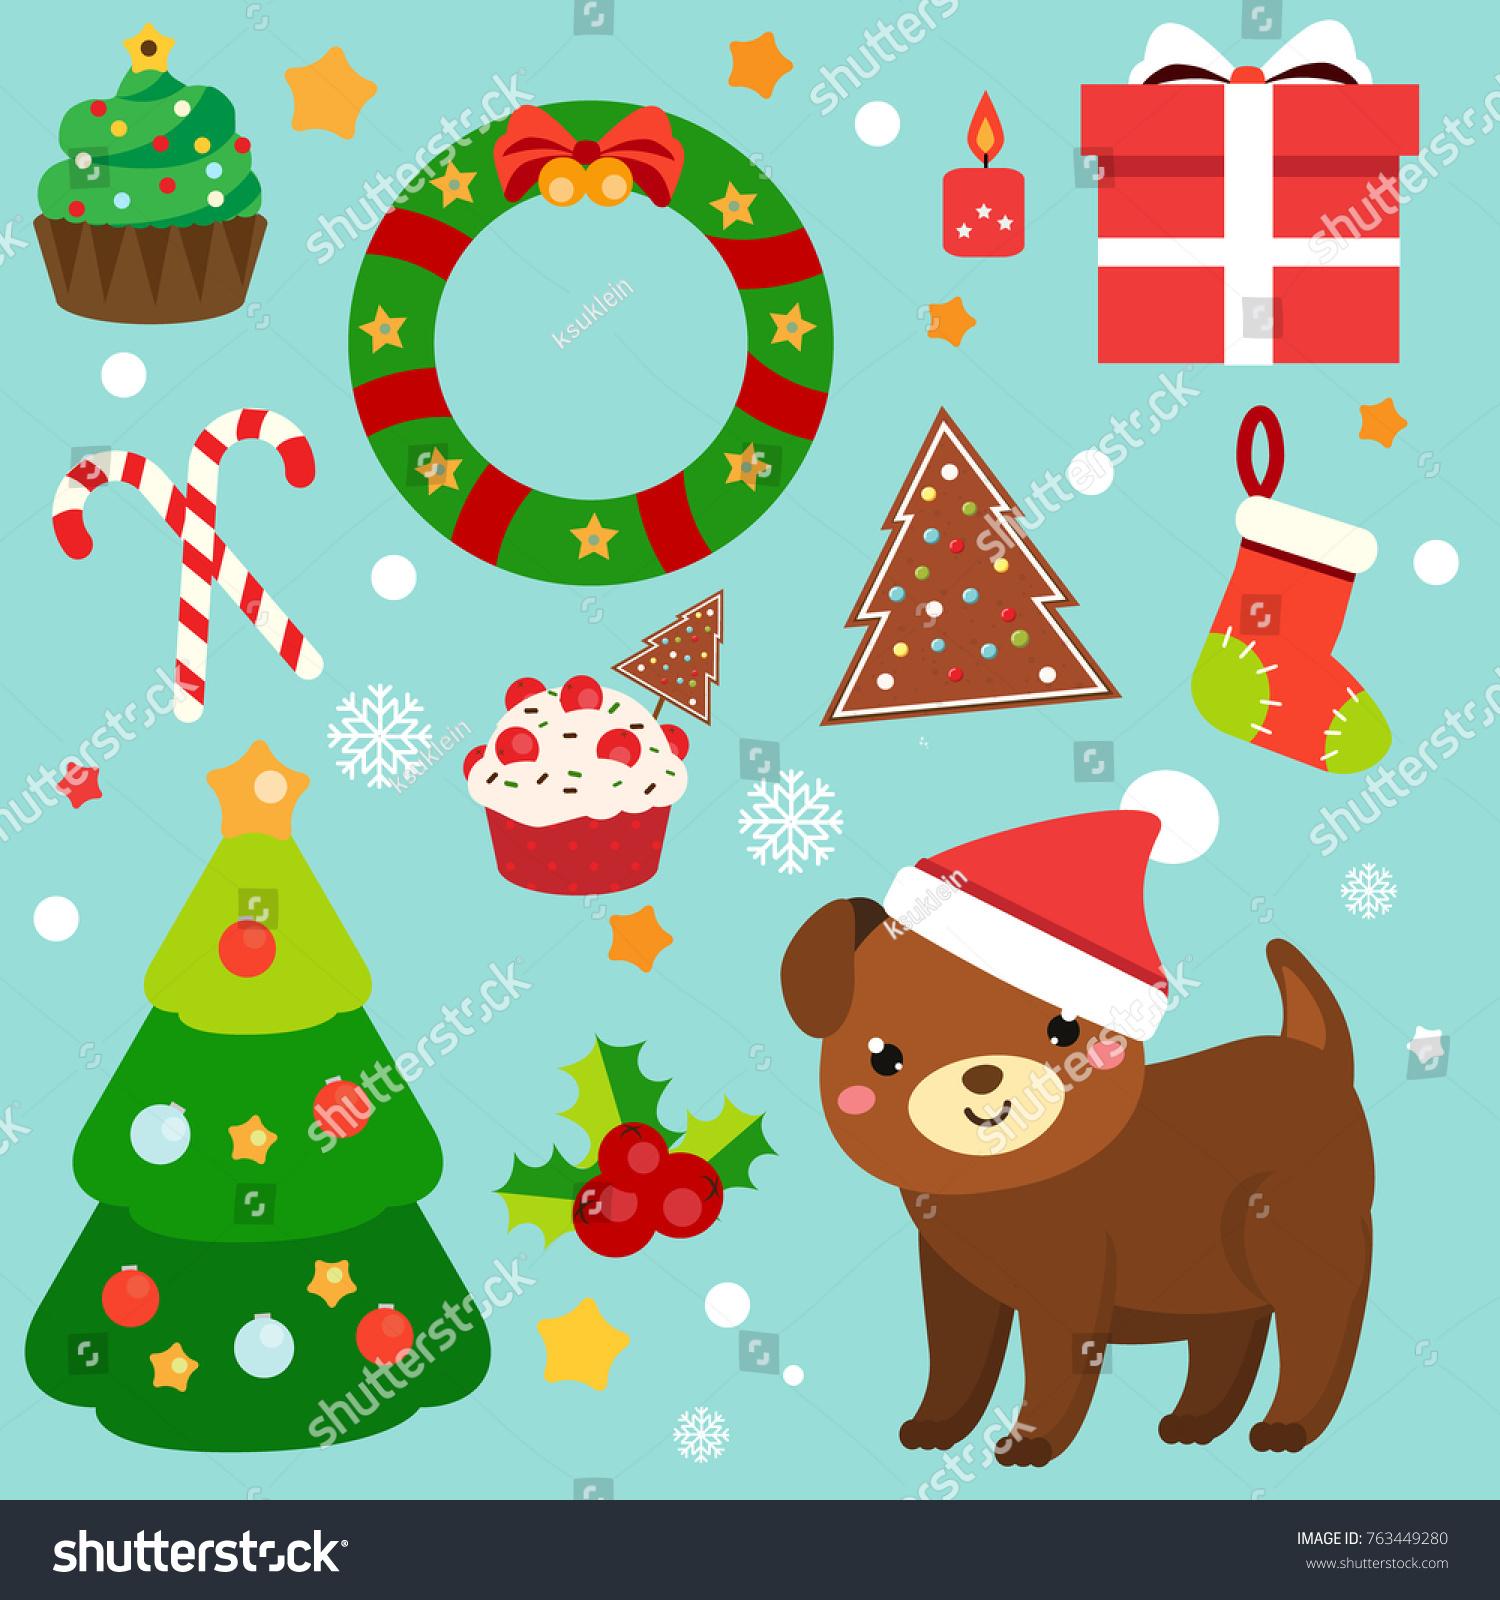 Christmas Clip Art 2018 New Year Stock Vector (Royalty Free ...